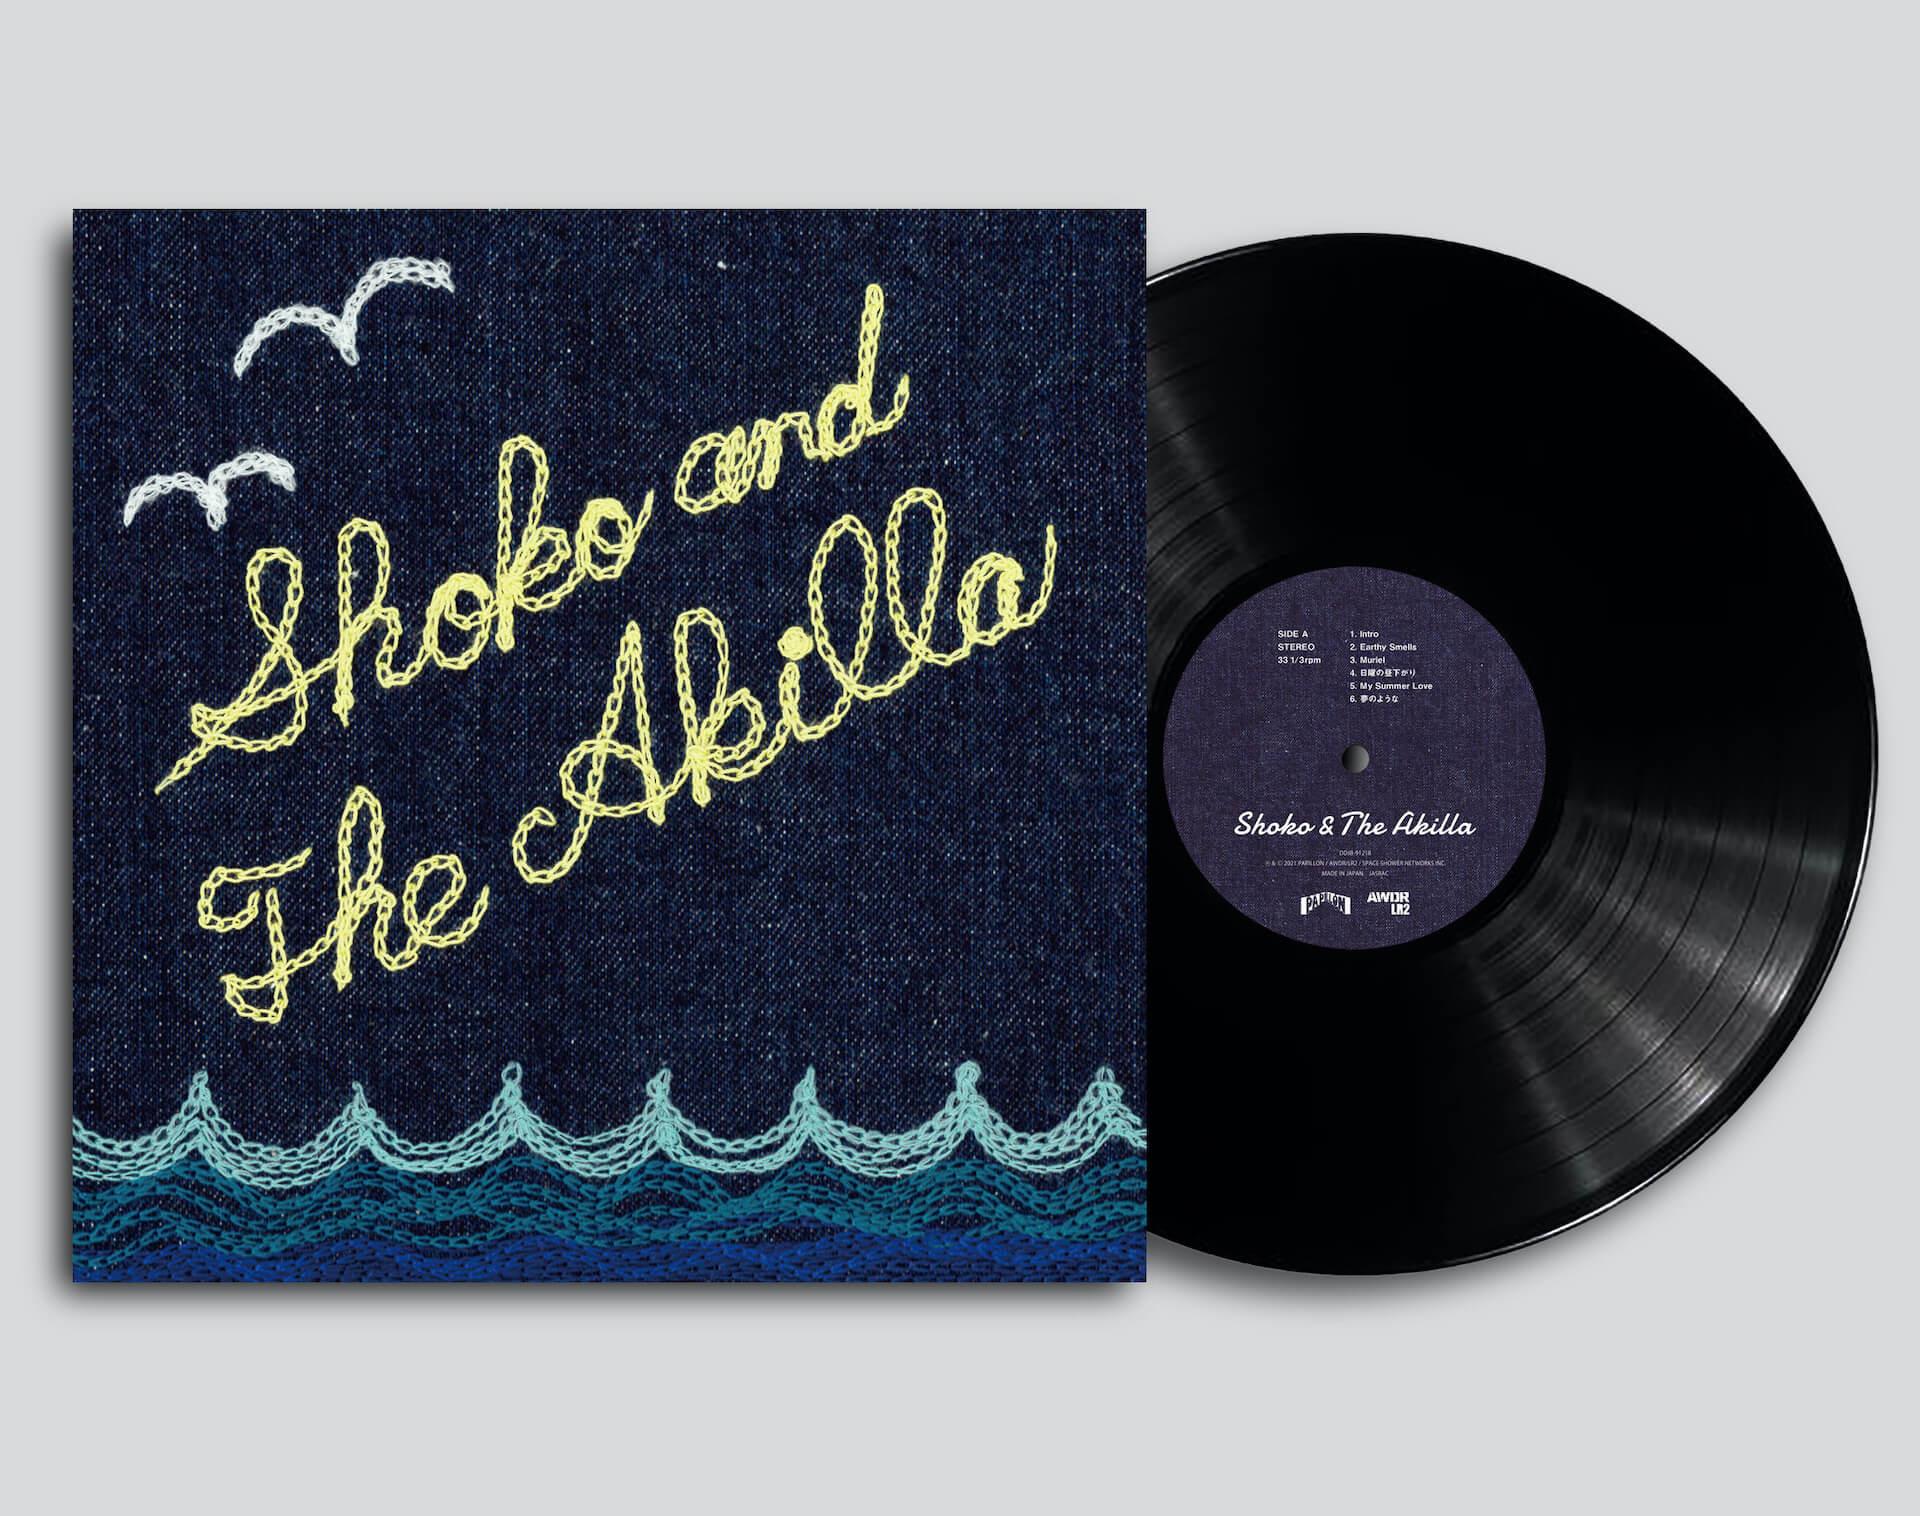 Shoko & The Akillaのファースト・アルバム『Shoko & The Akilla』が待望の初LP化|BUSHMINDのリミックスも収録 music210426-shoko-theakilla-2